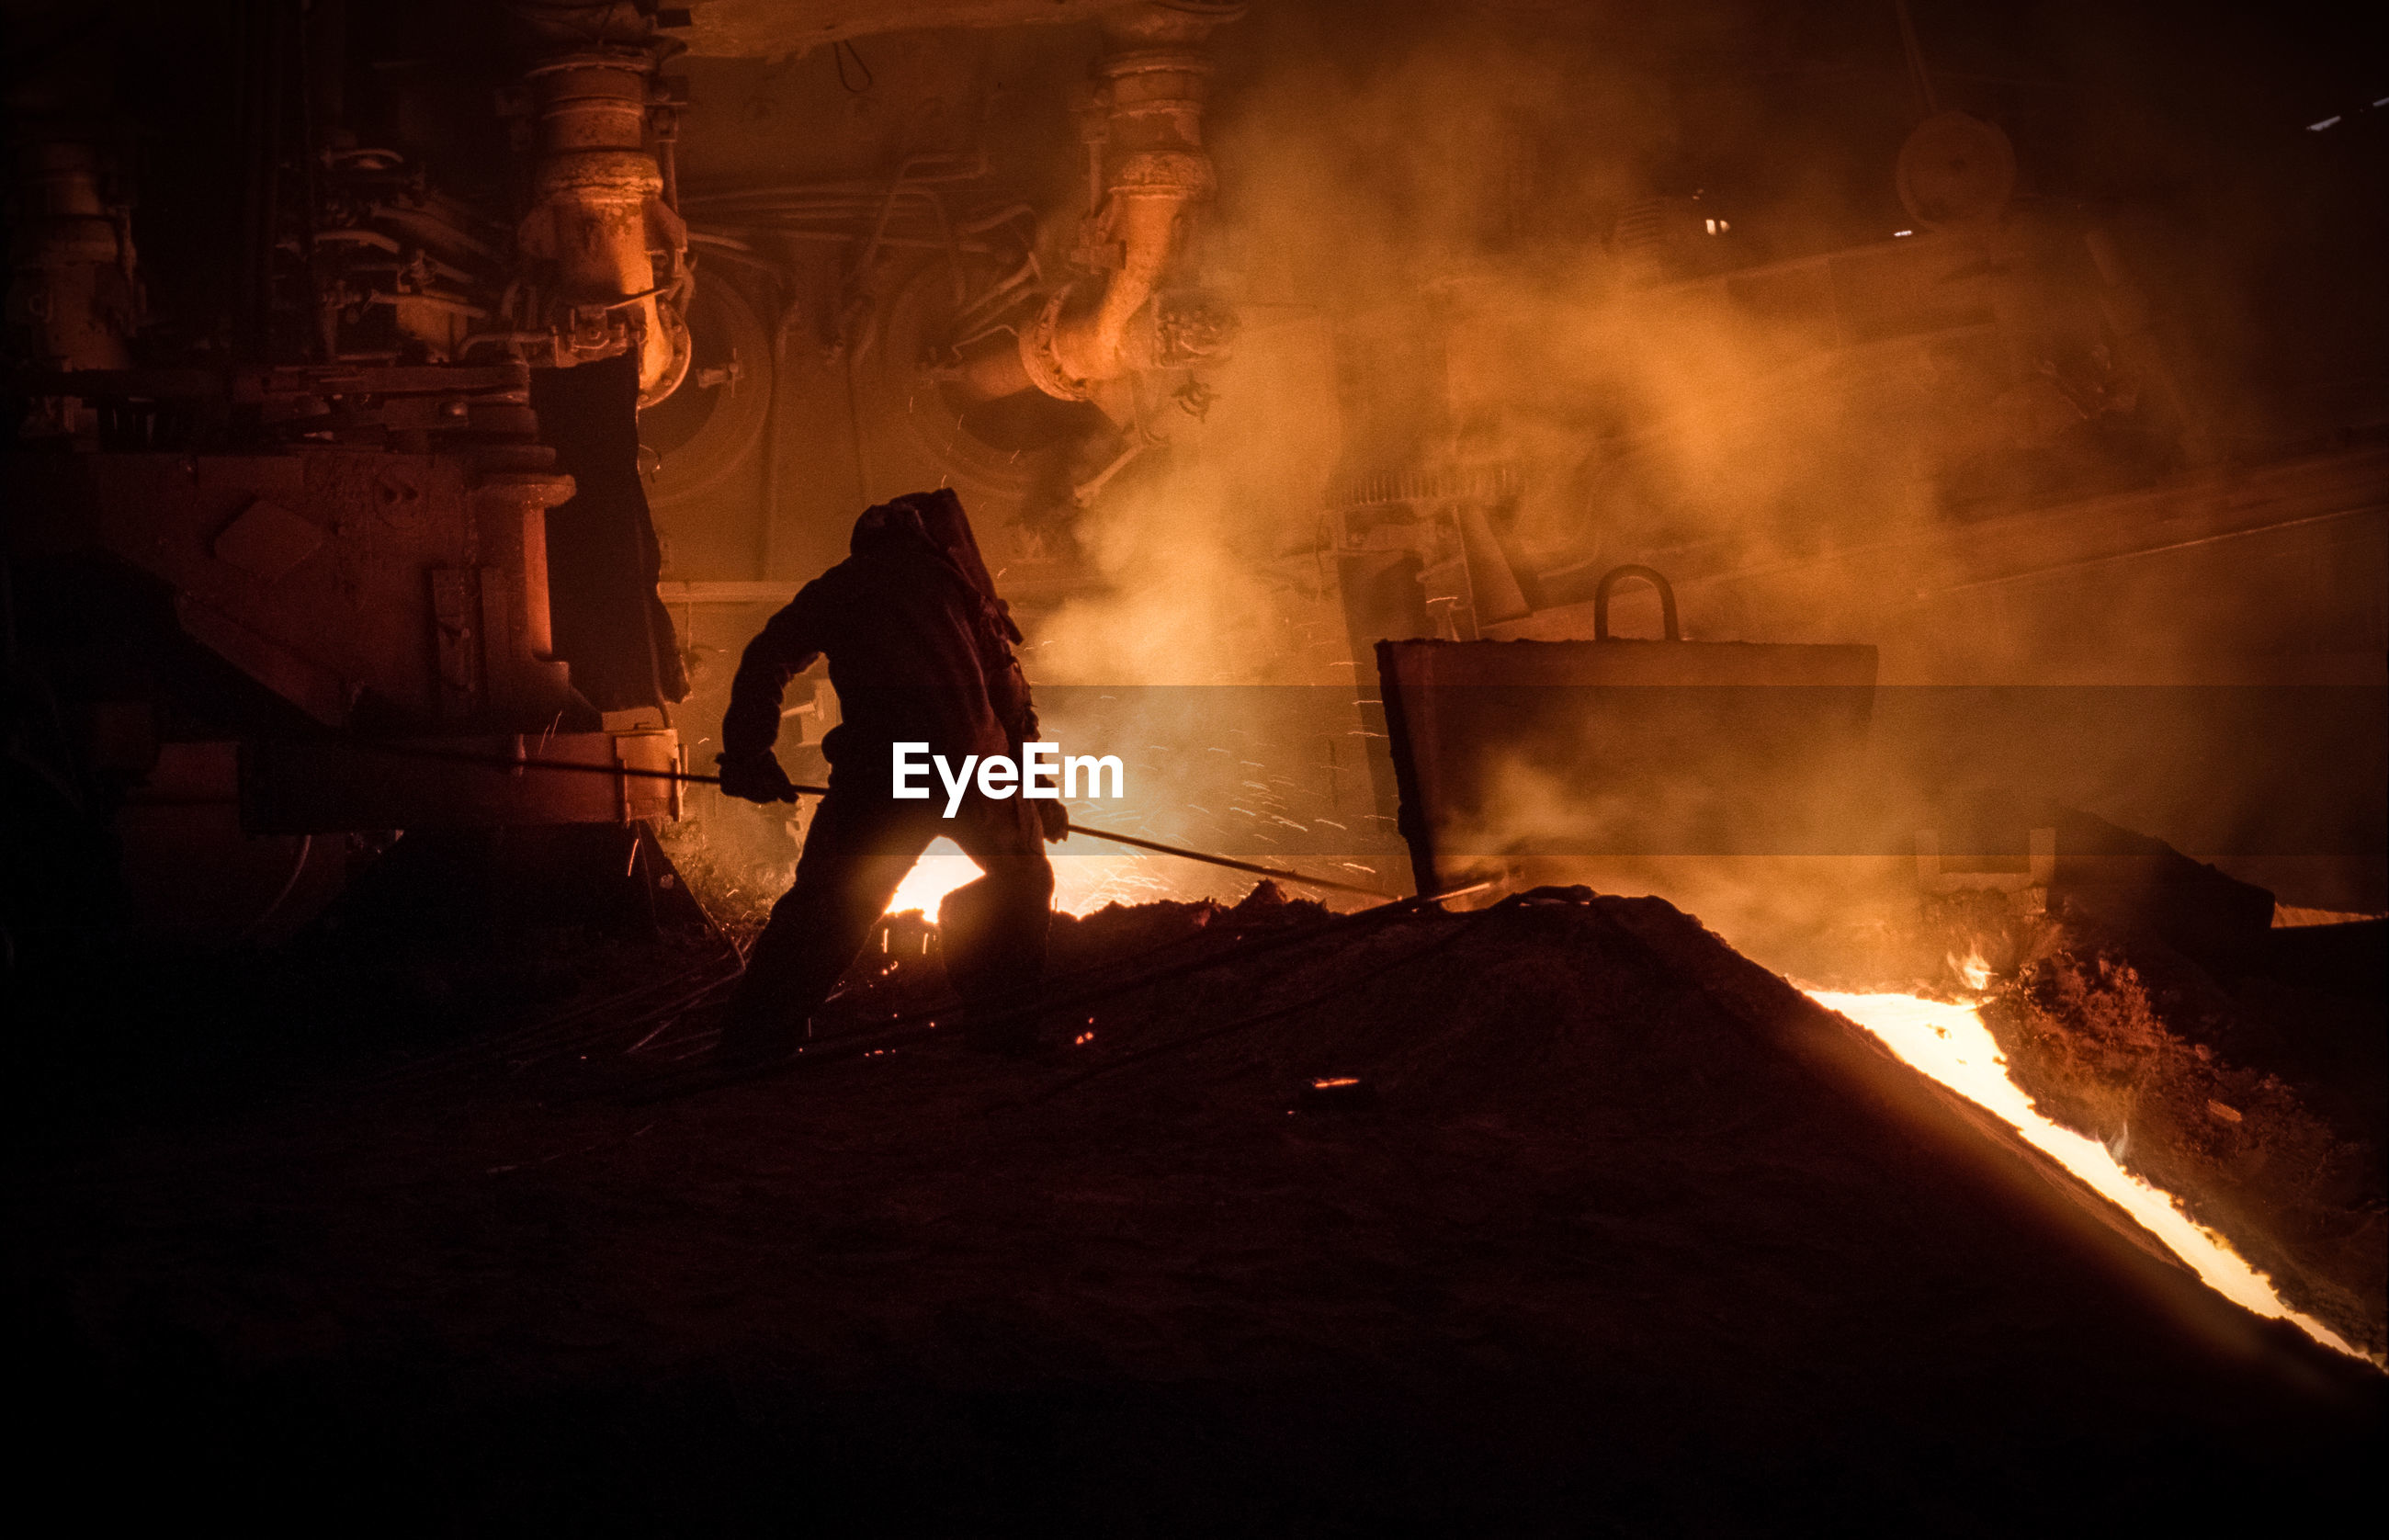 Man working in industry